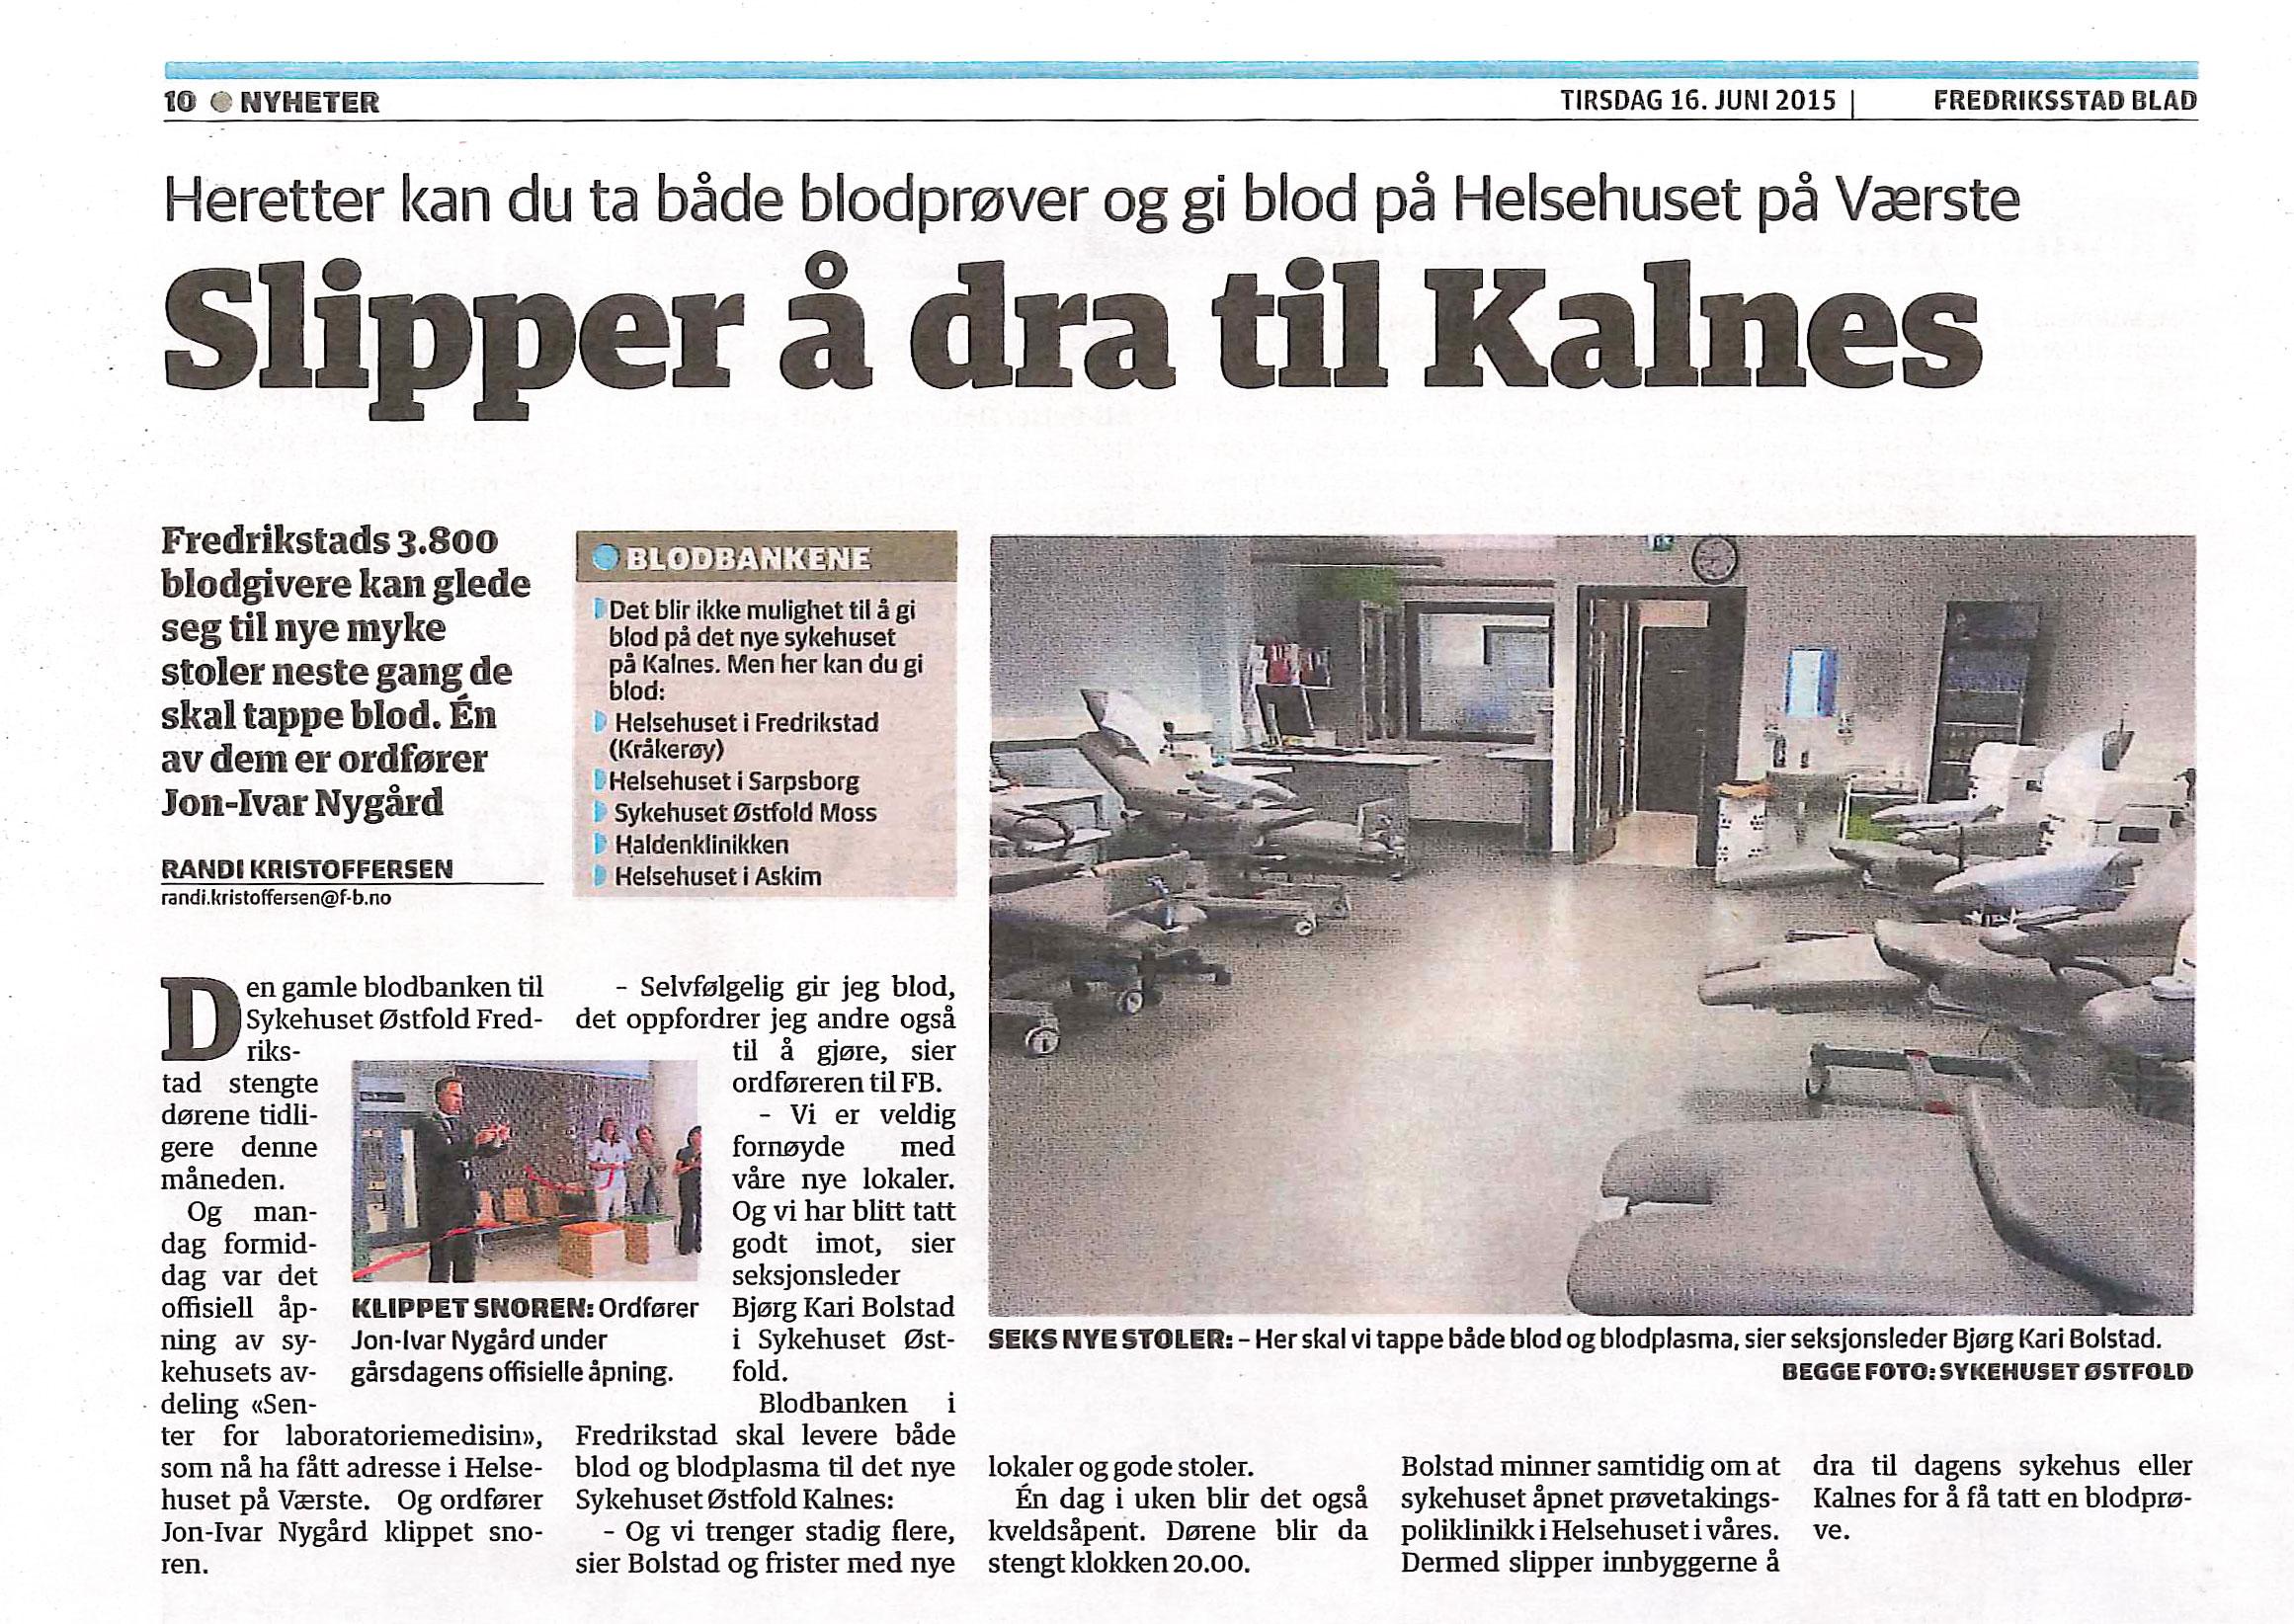 Fra Fredriksstad Blad 16. juni 2015